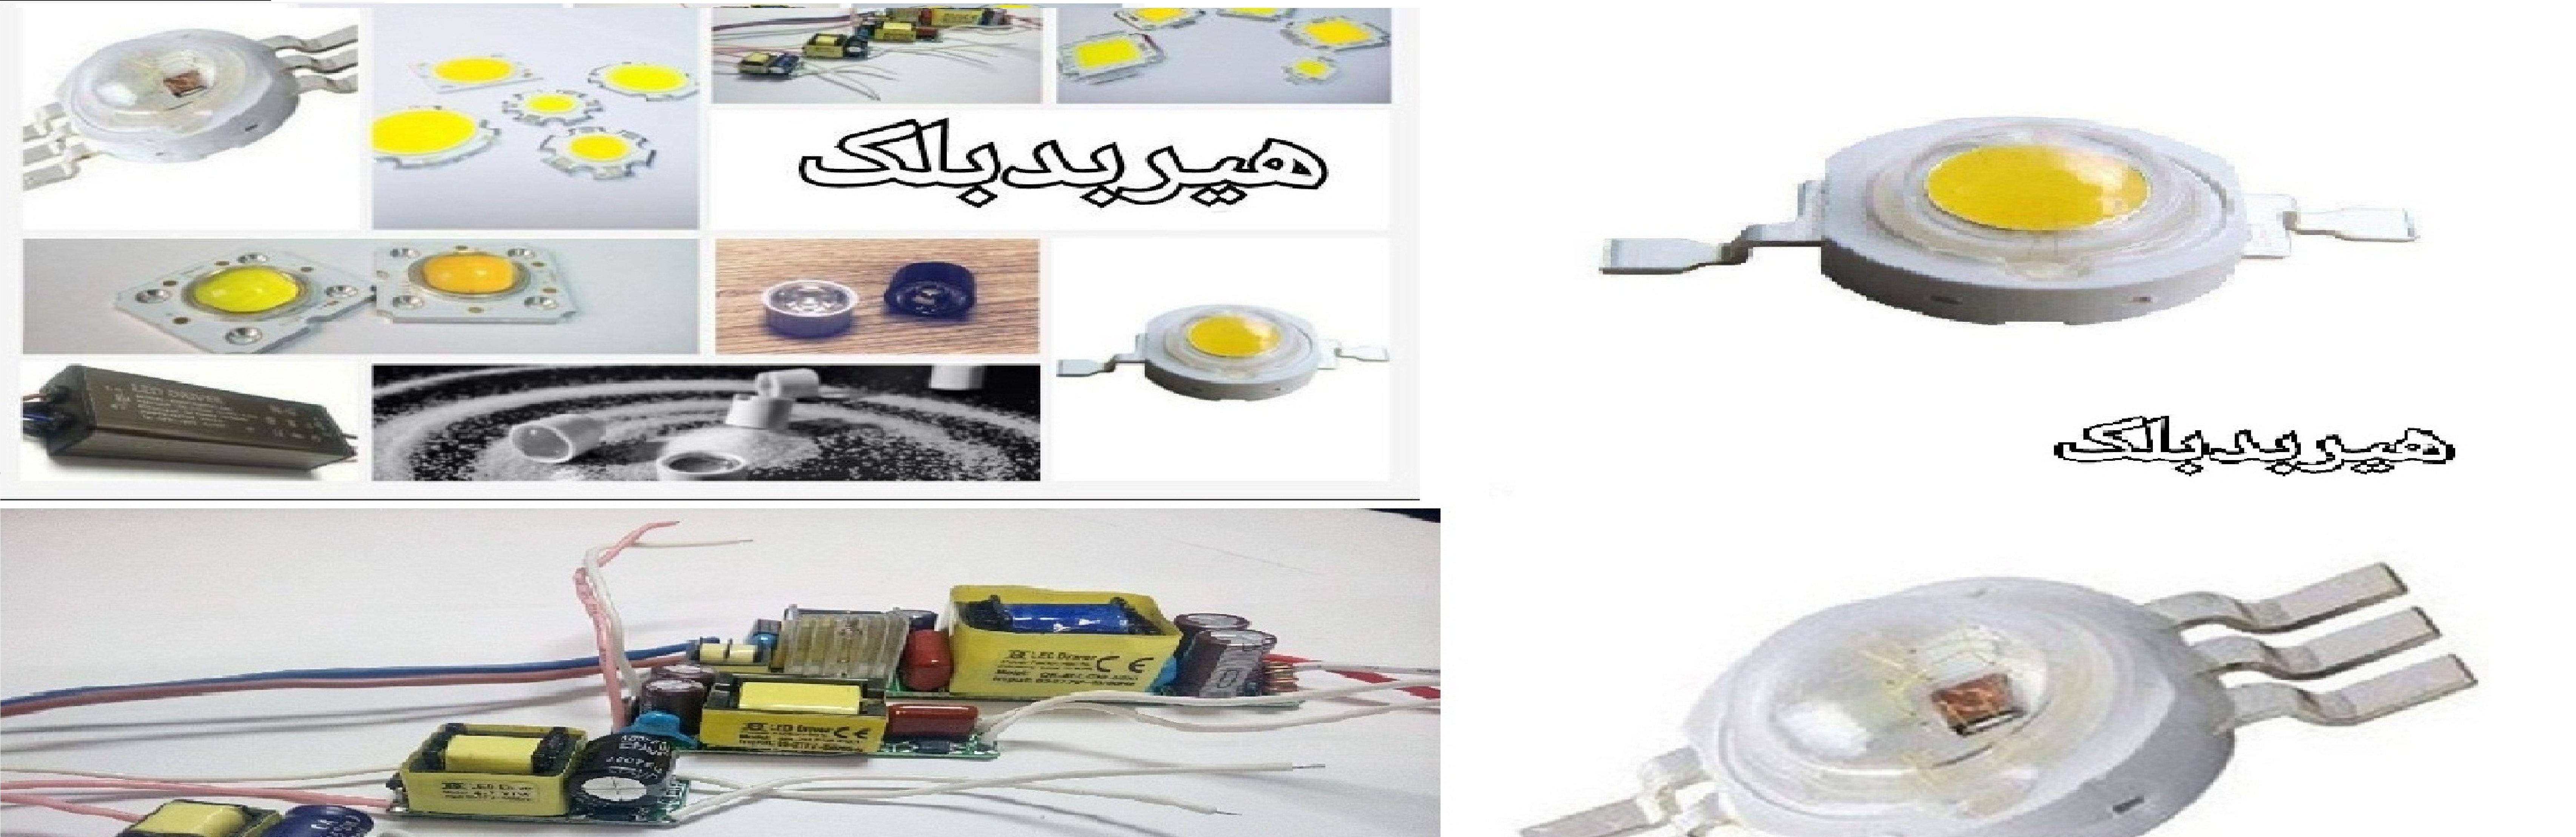 Untitledتاببببا - Copy